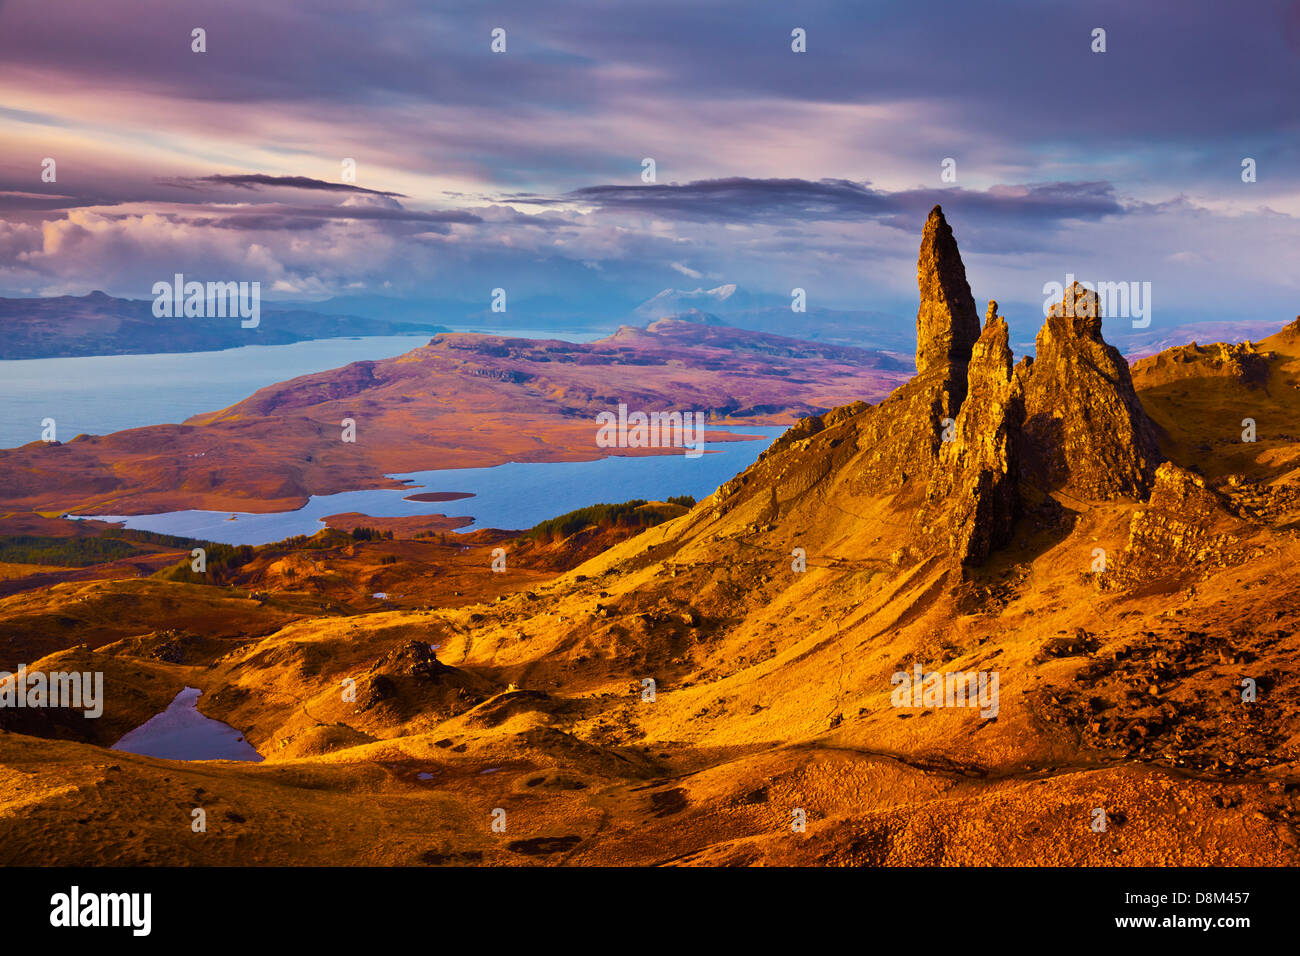 The Old Man of Storr at dawn sunrise Trotternish peninsula Isle of Skye Highlands and Islands Scotland UK GB EU - Stock Image